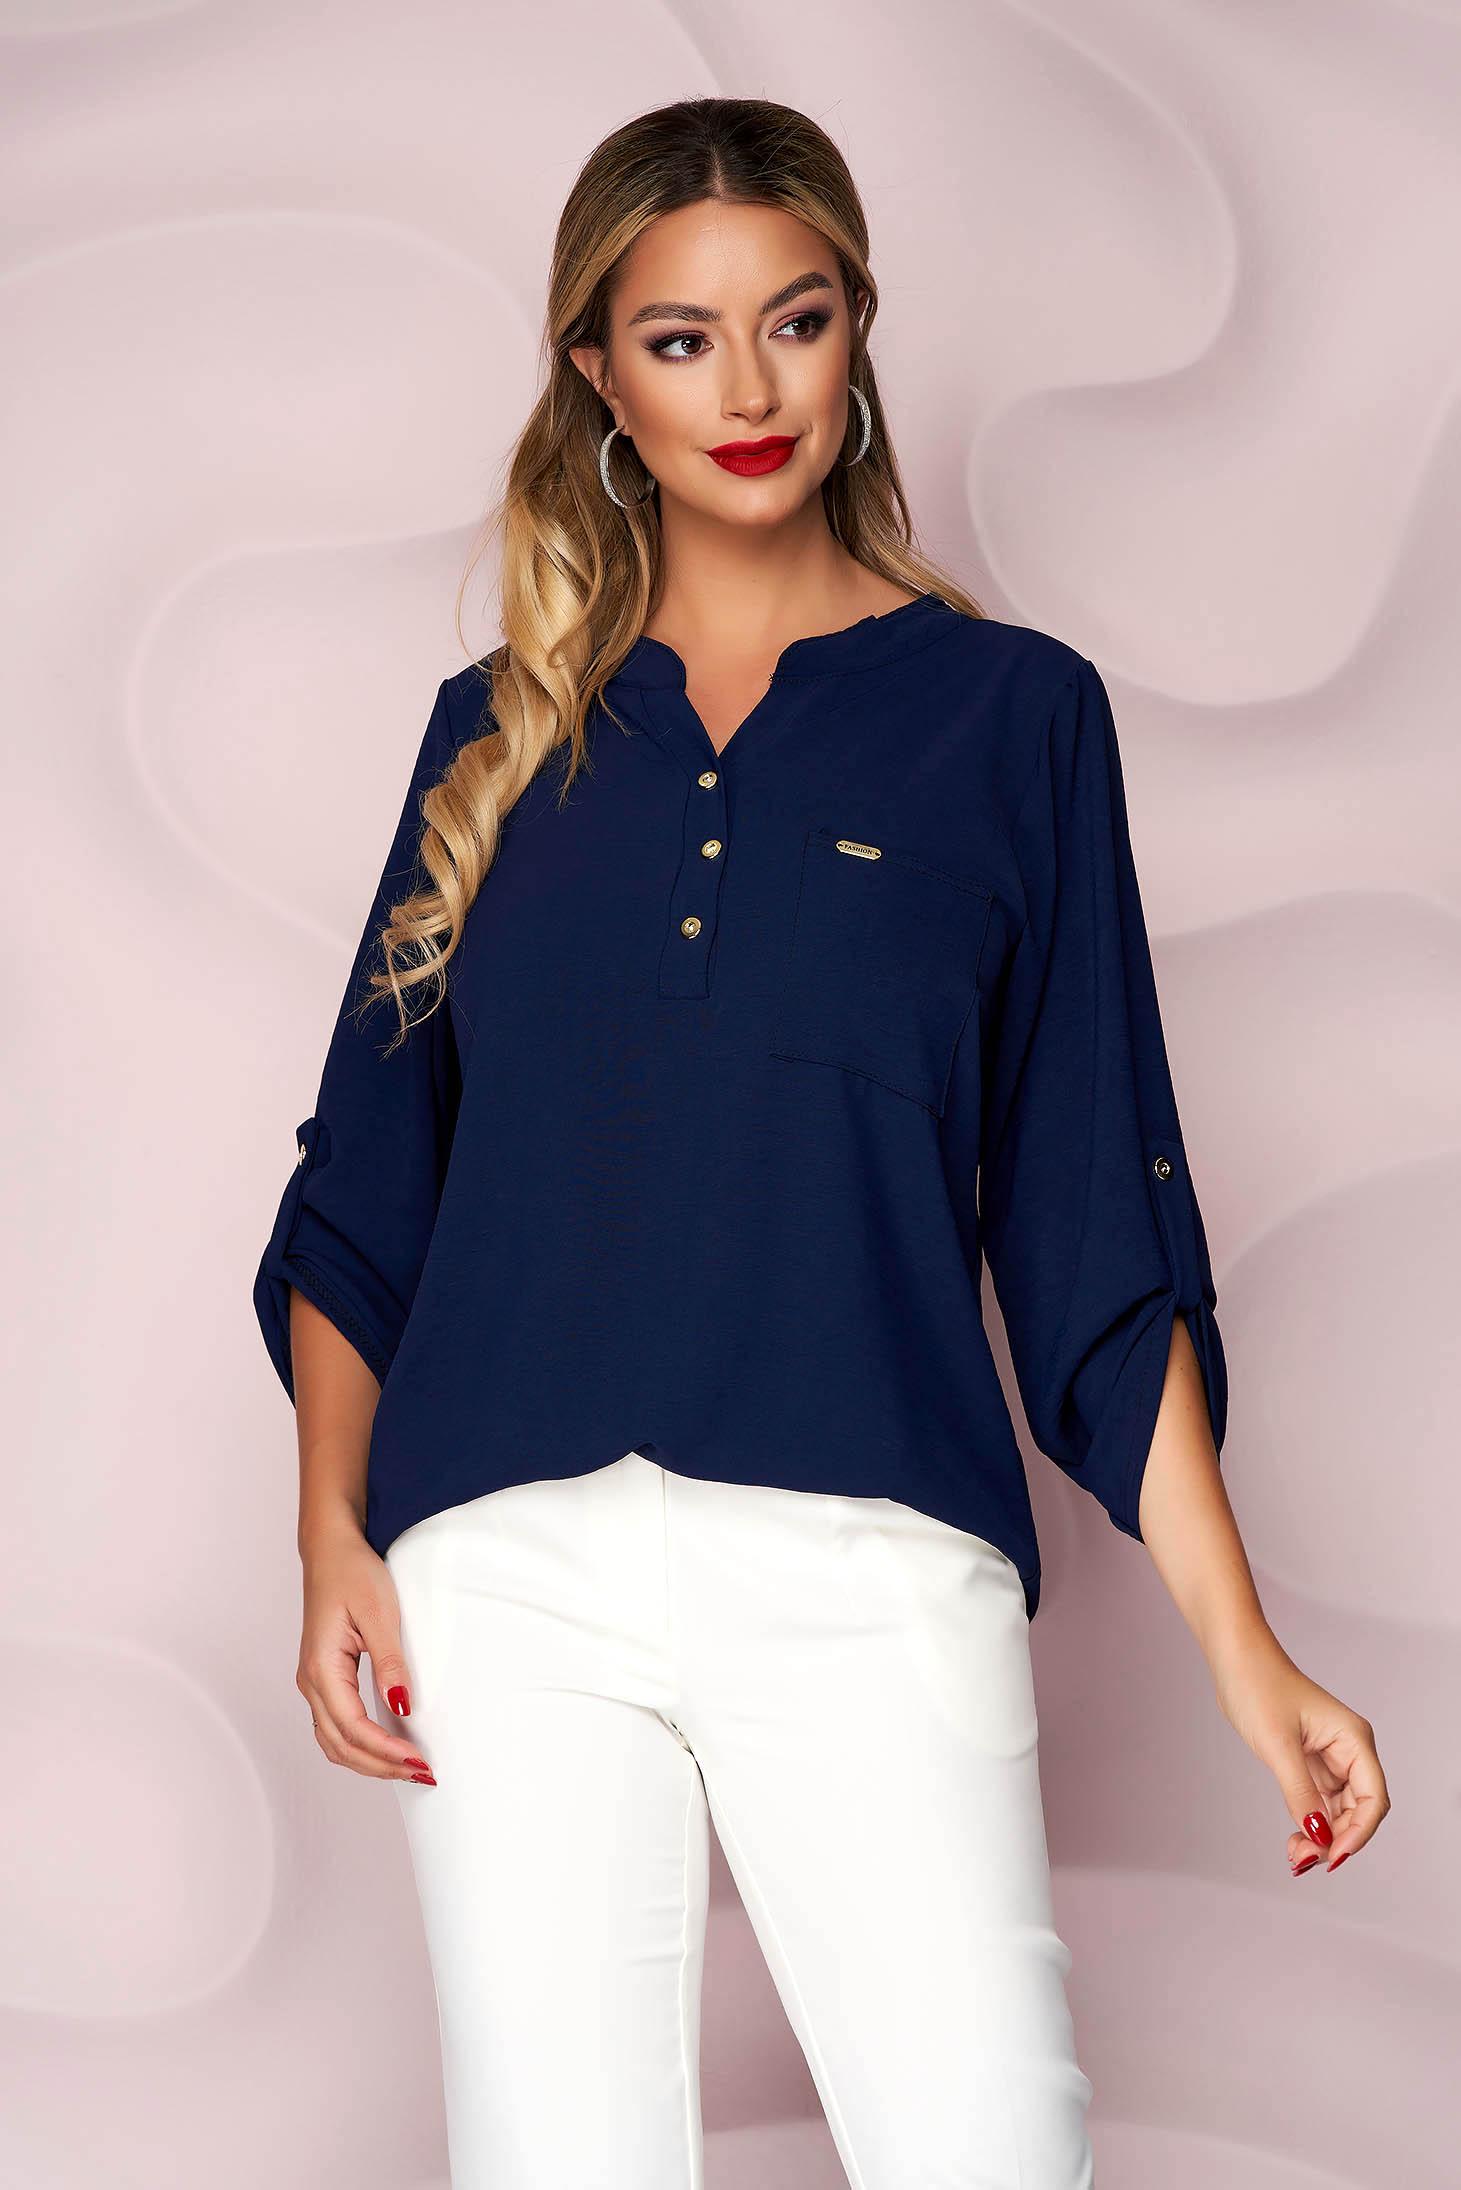 Darkblue women`s blouse loose fit wrinkled material a front pocket